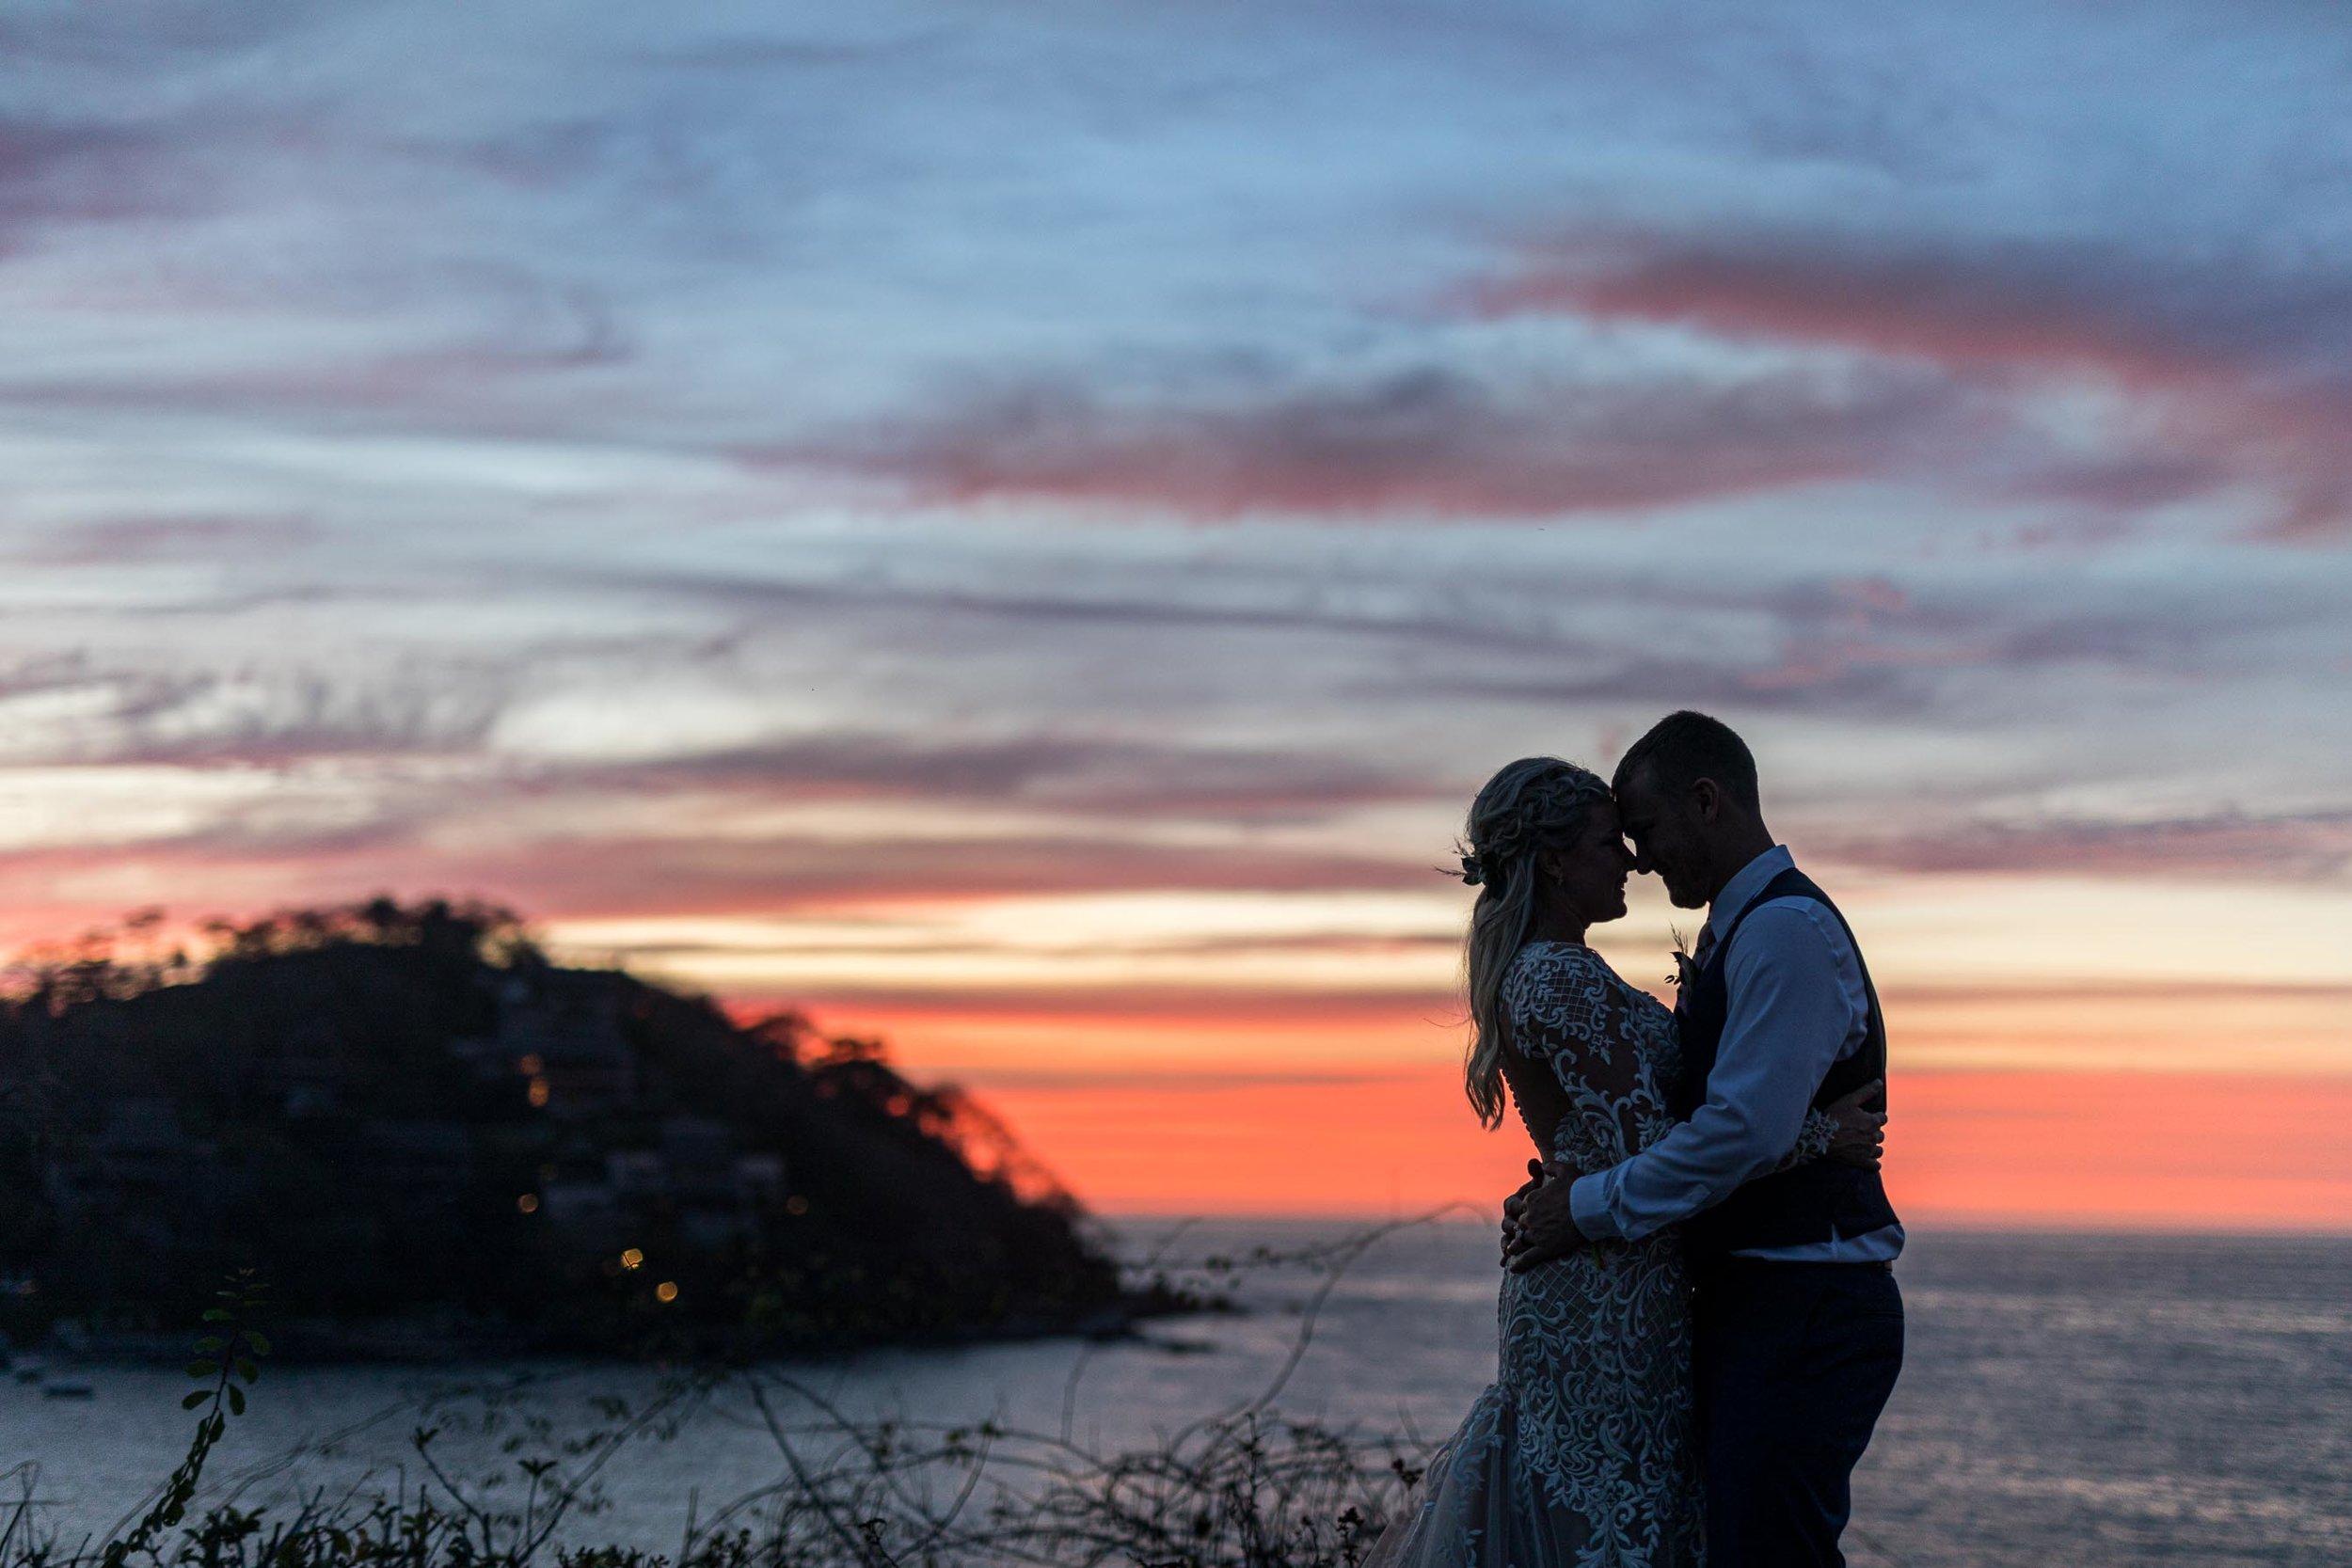 Photographers that photograph weddings